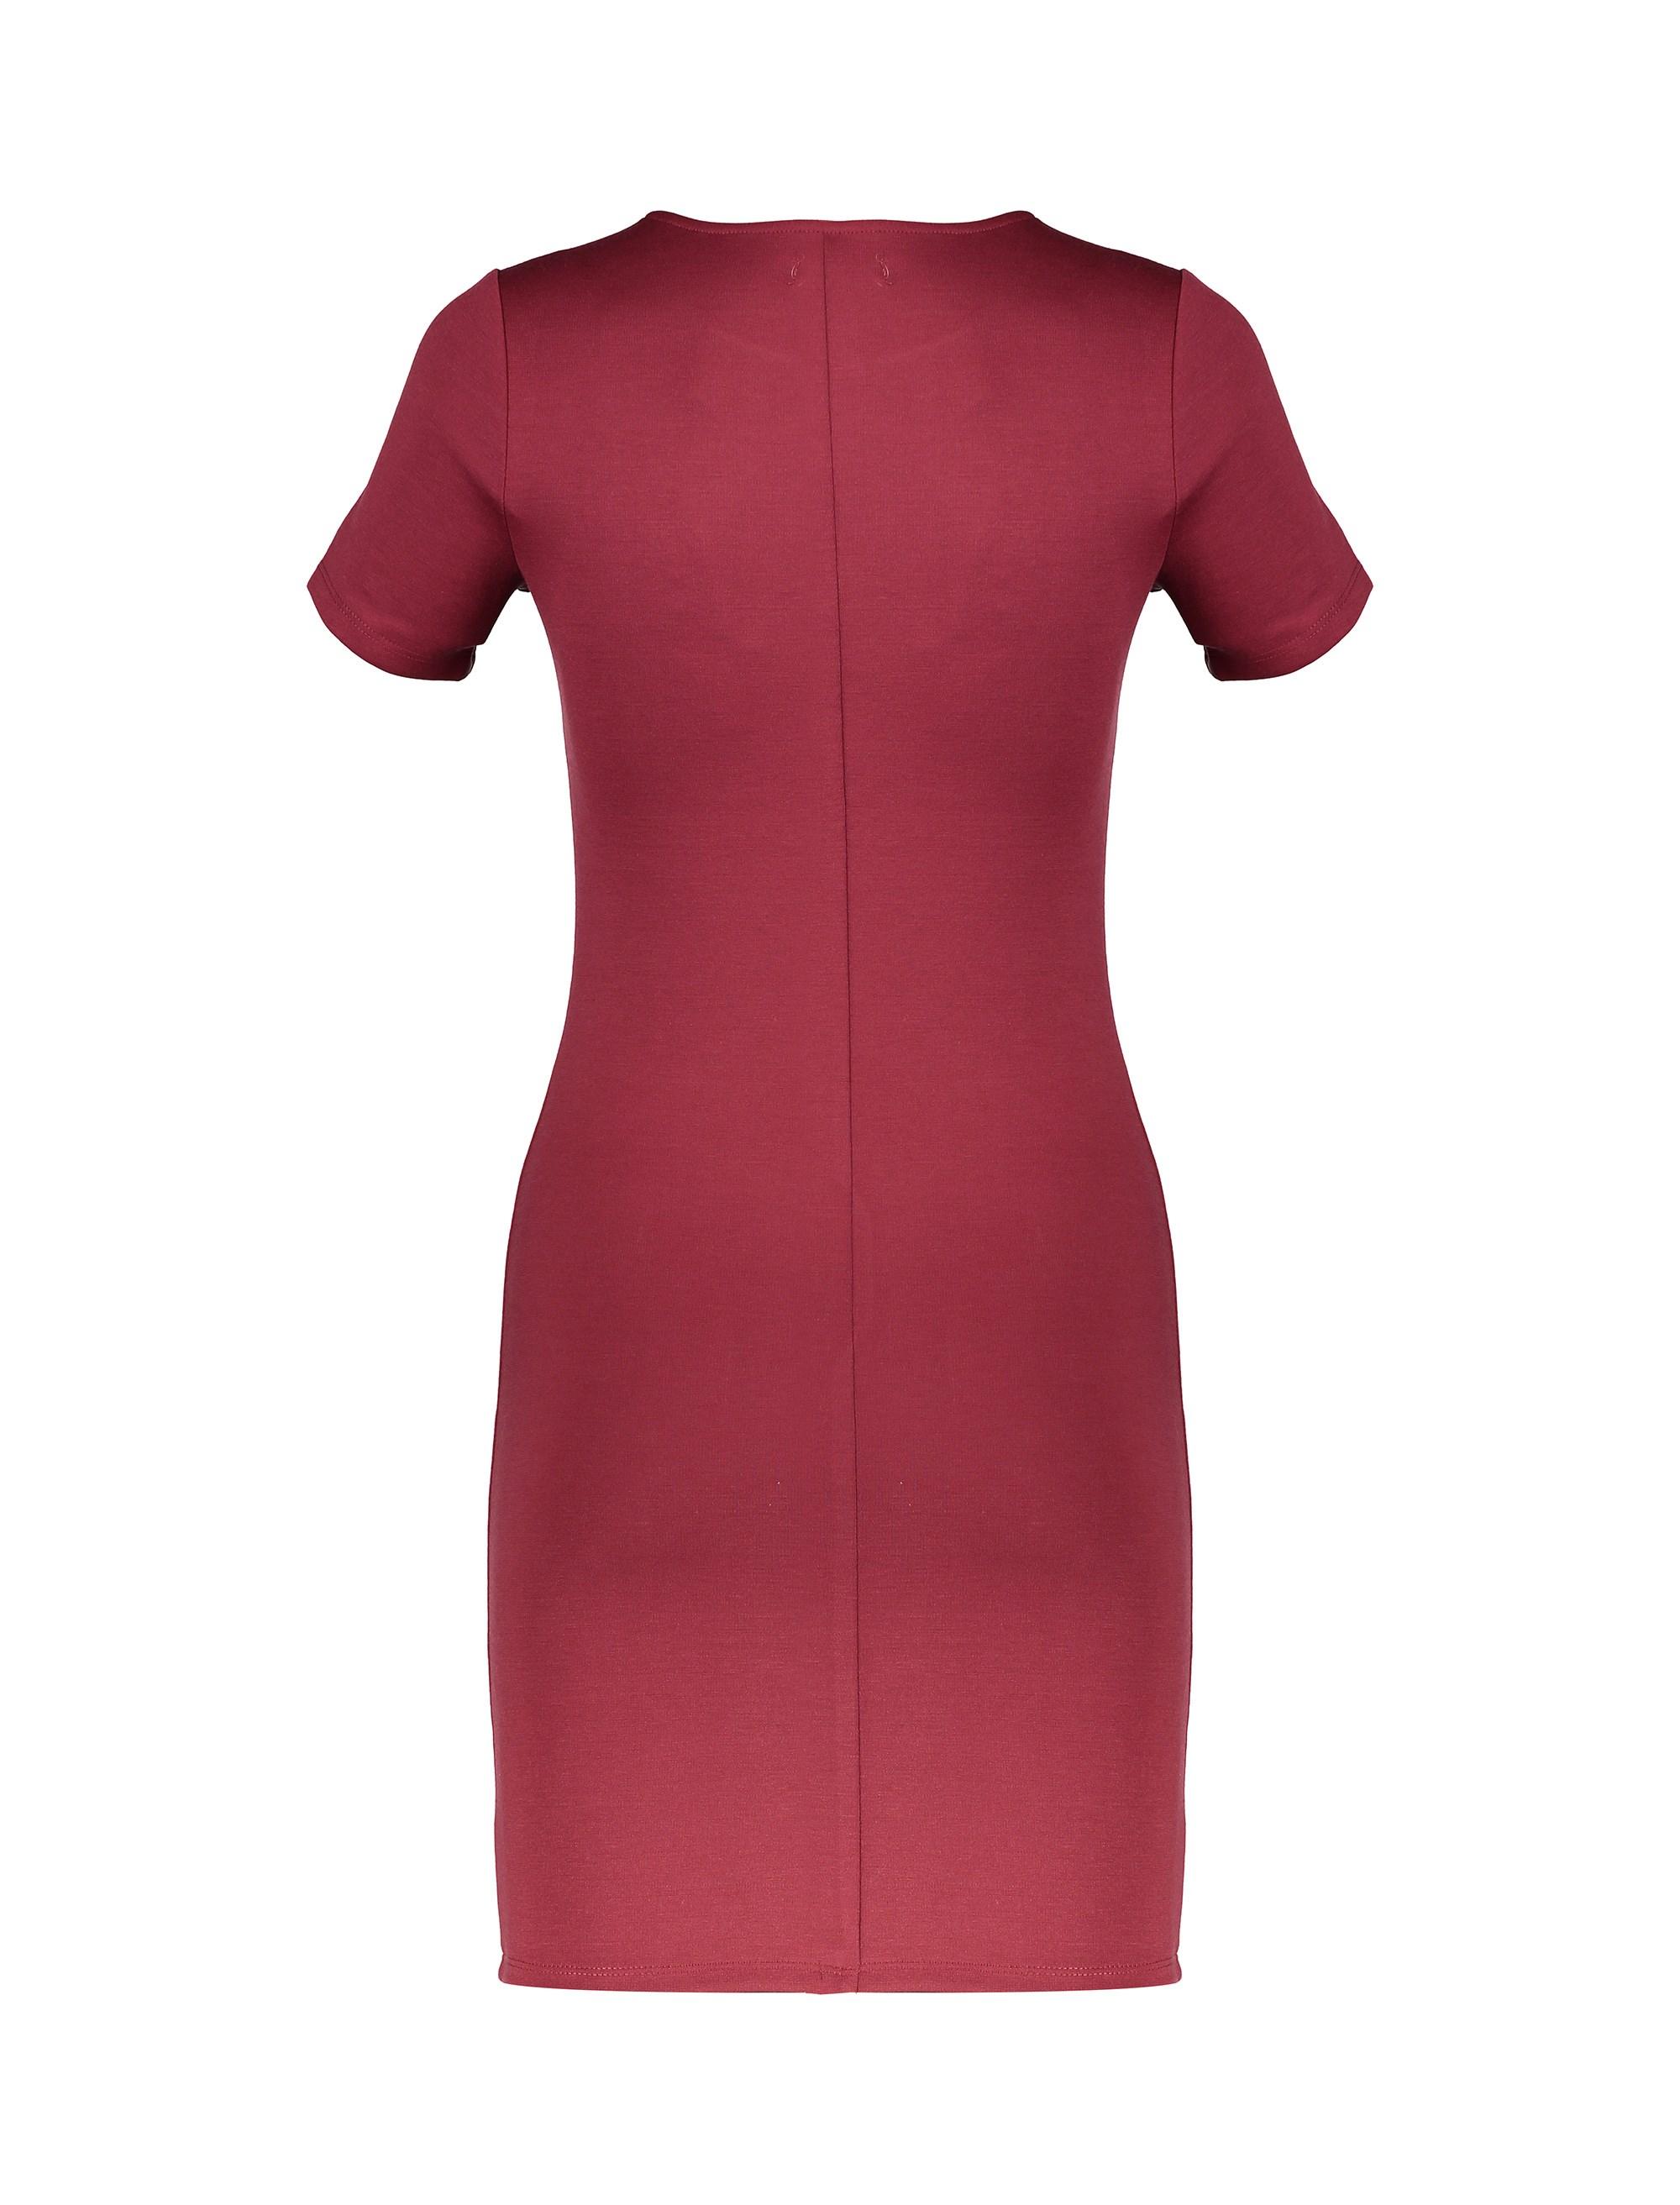 پیراهن کوتاه زنانه - جنیفر - قرمز - 2